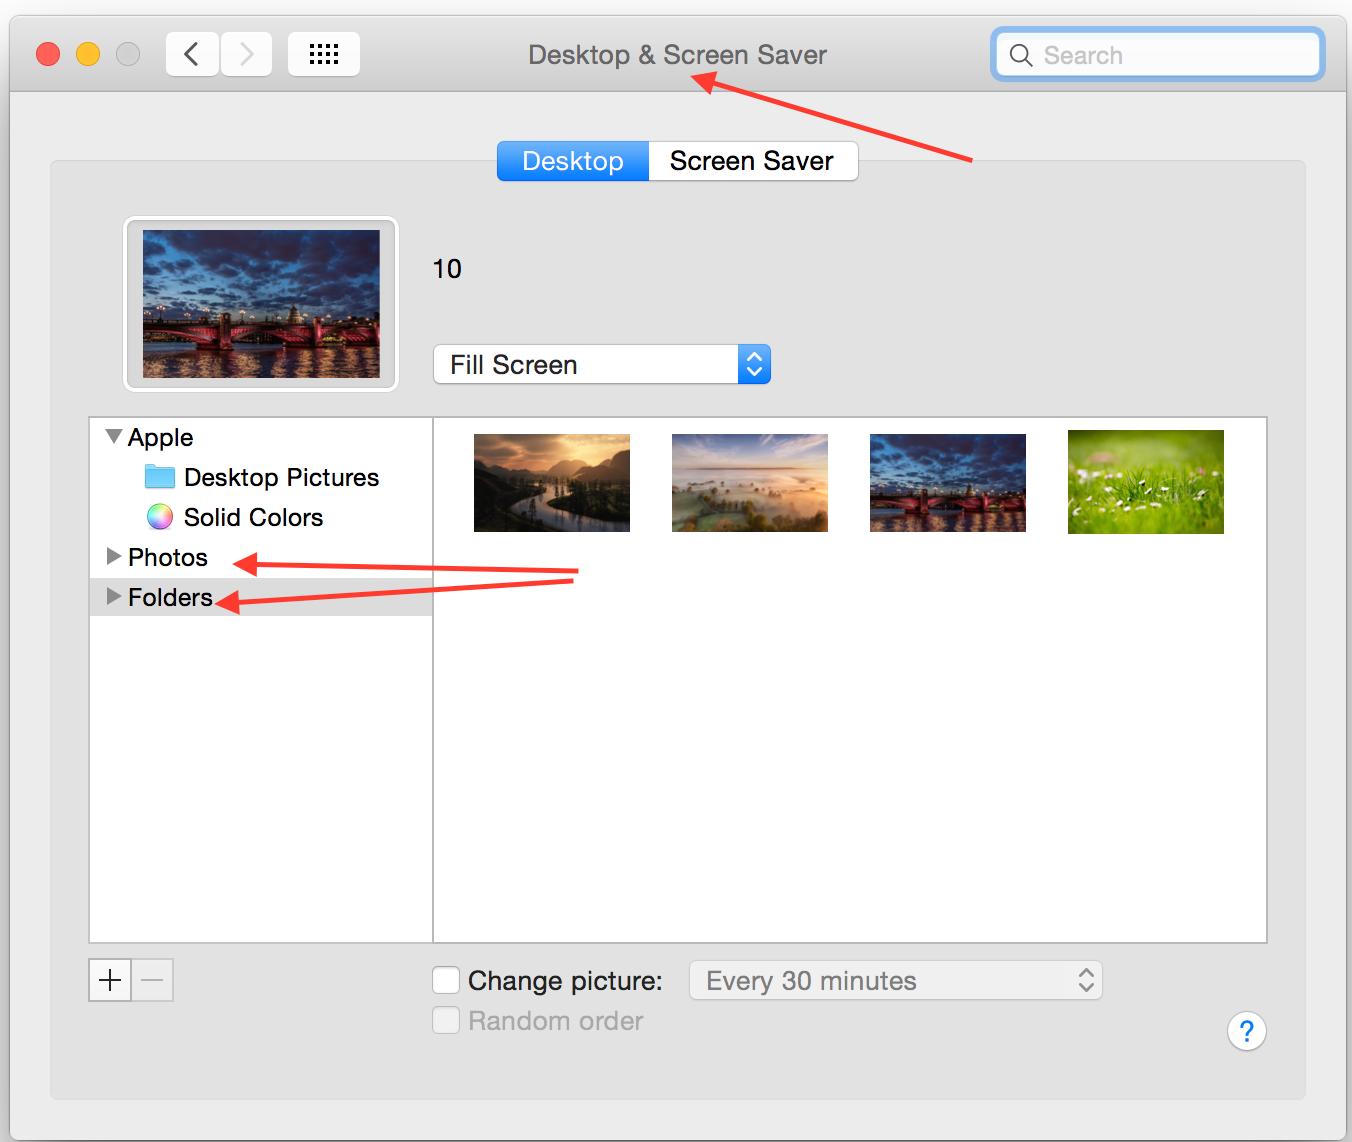 Desktop Background Resets After Reboot Mac